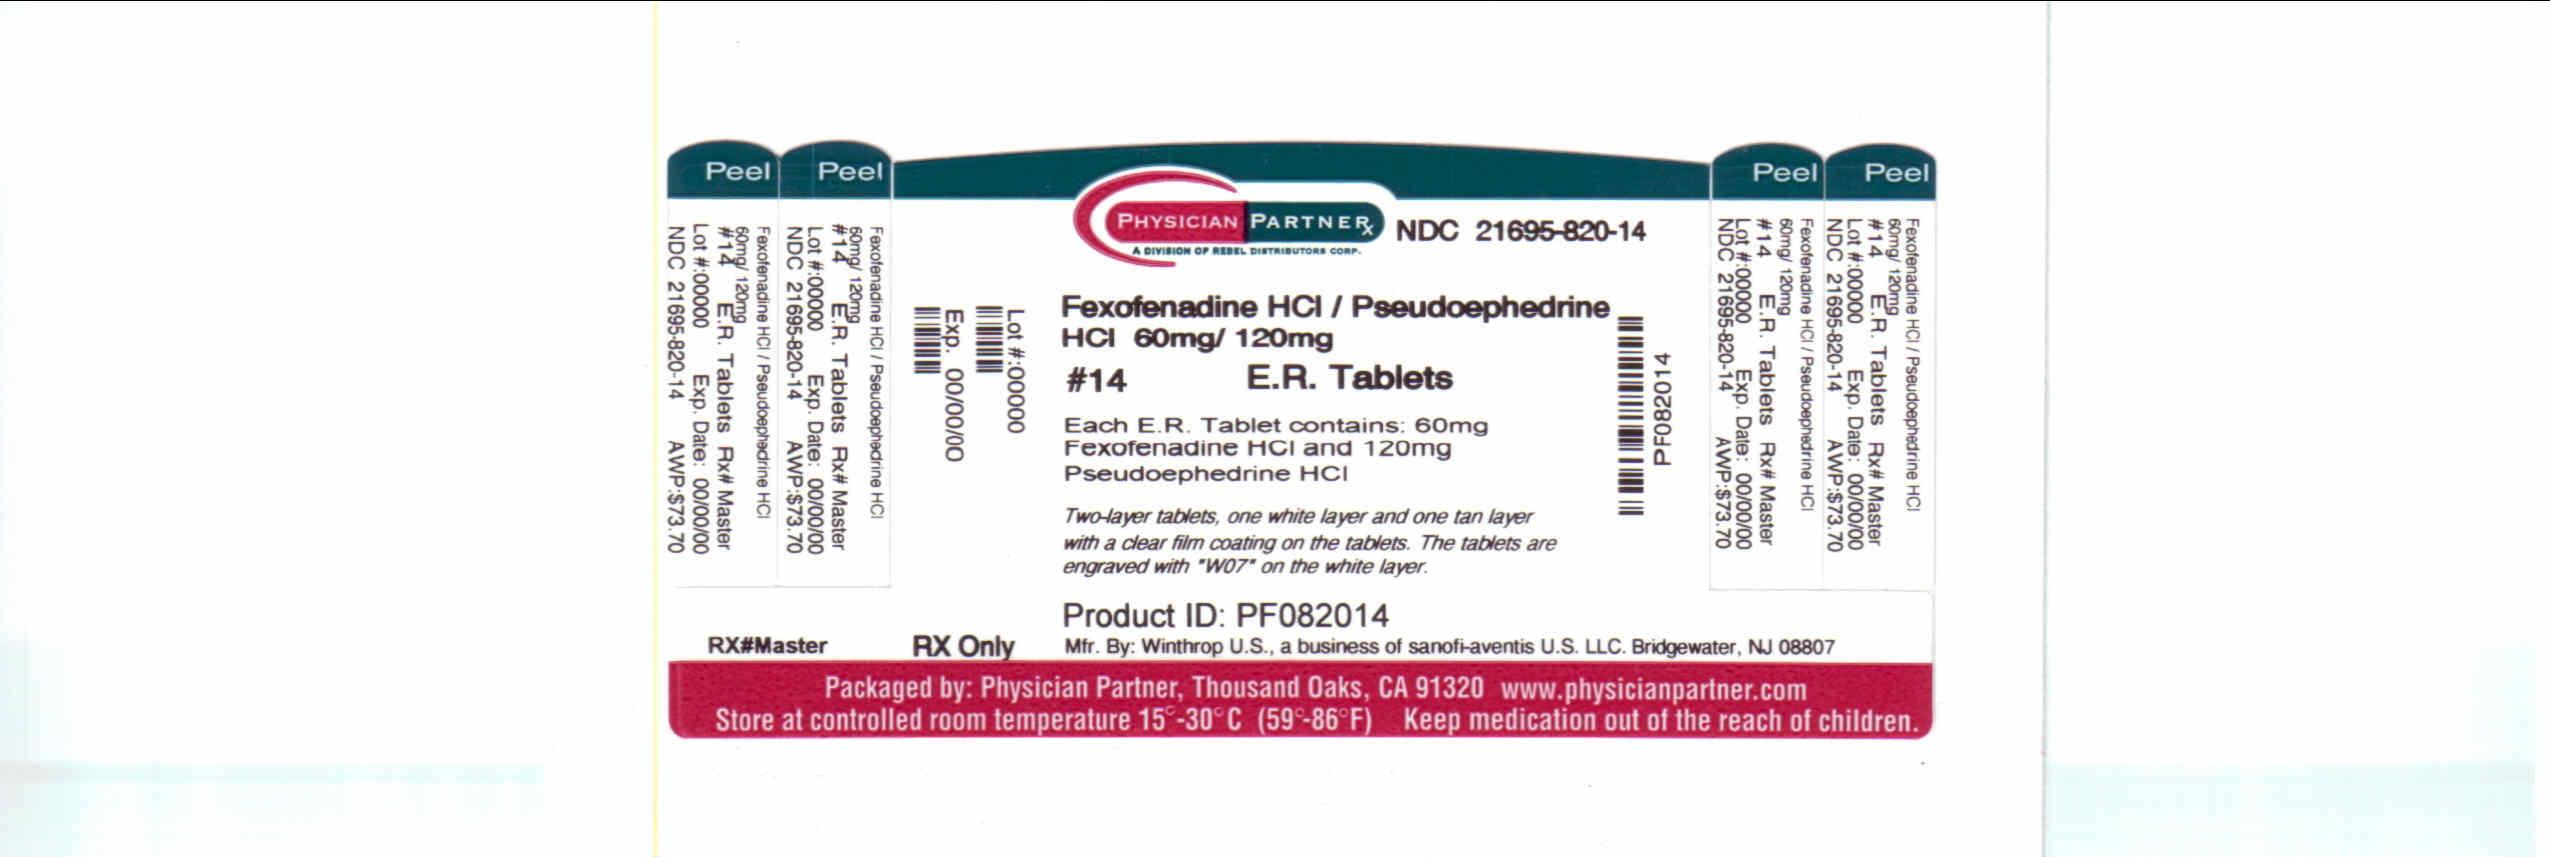 Fexofenadine HCL/Pseudoephenadrine 60/120mg